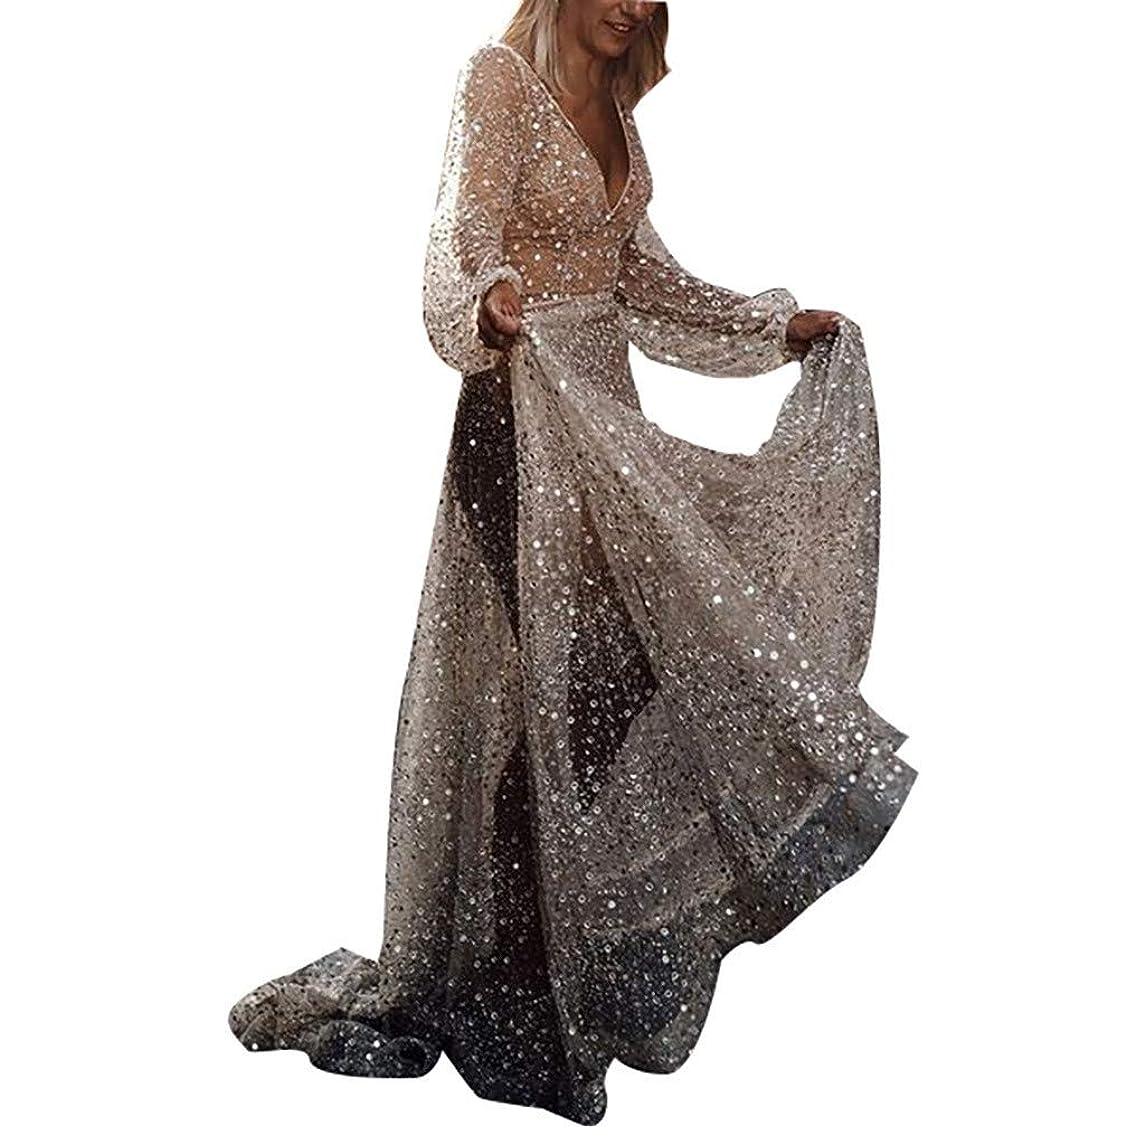 Sparkly Dress??Fashion Women Sequin Lace Wedding Dress Floor Length Dress Sleevless Long Maxi Dress Elegant